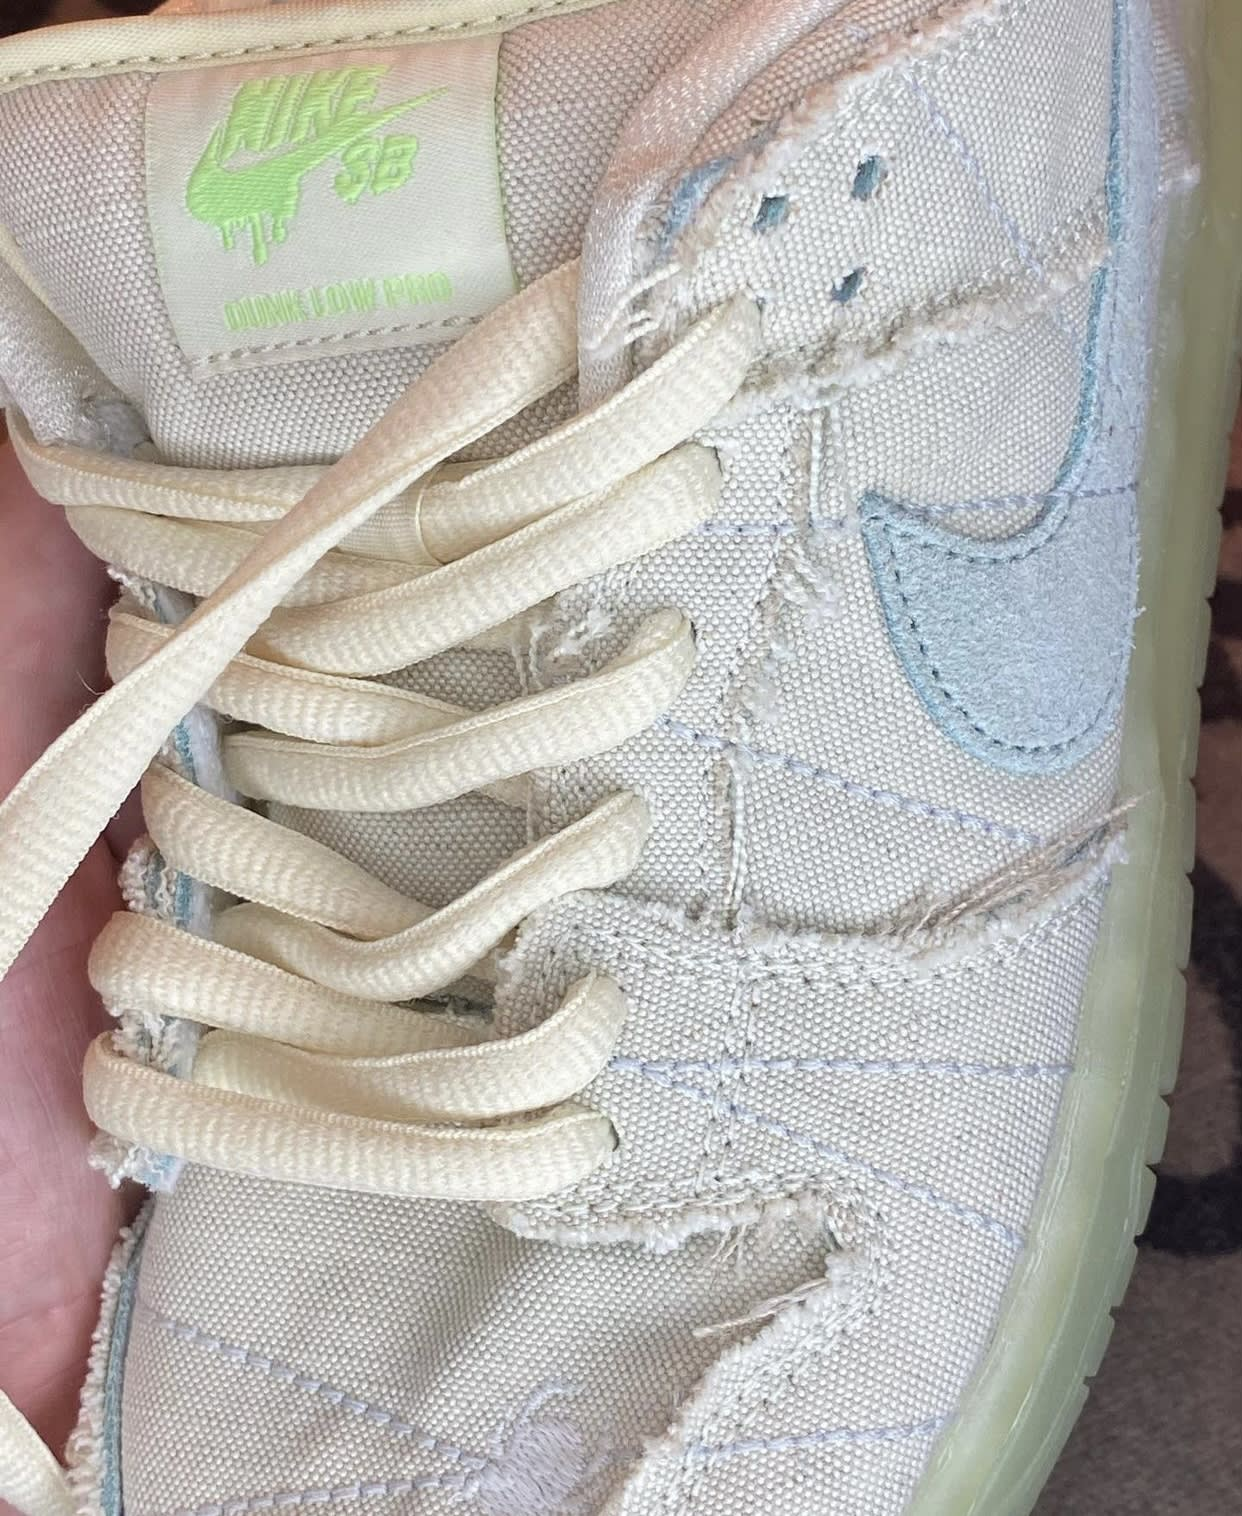 Nike SB Dunk Low Mummy Halloween DM0774-111 Laces